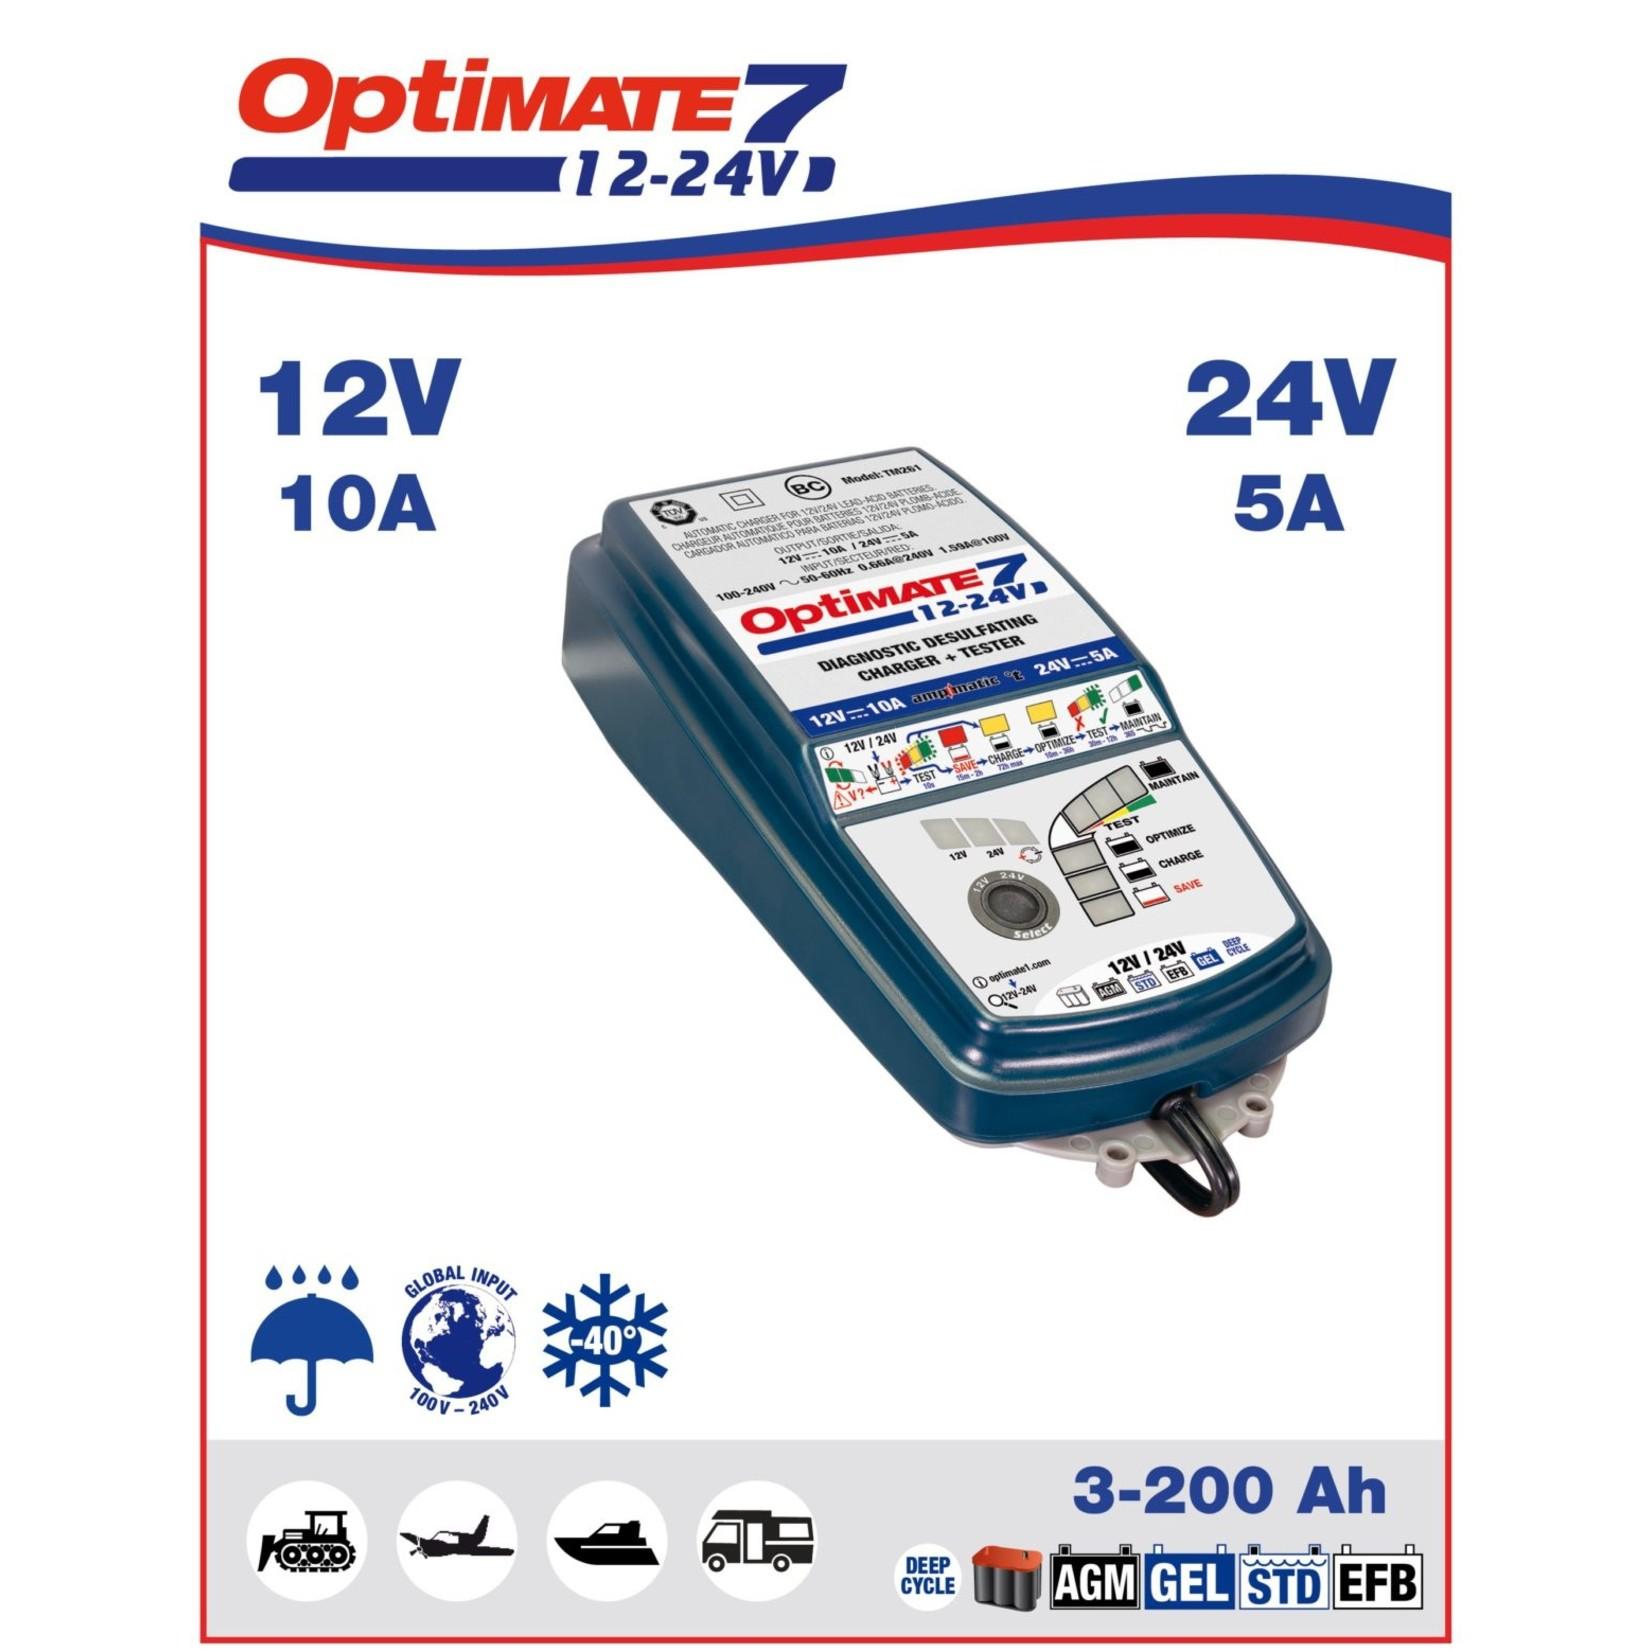 OptiMate OptiMate 7 12V-24V - Battery Charger